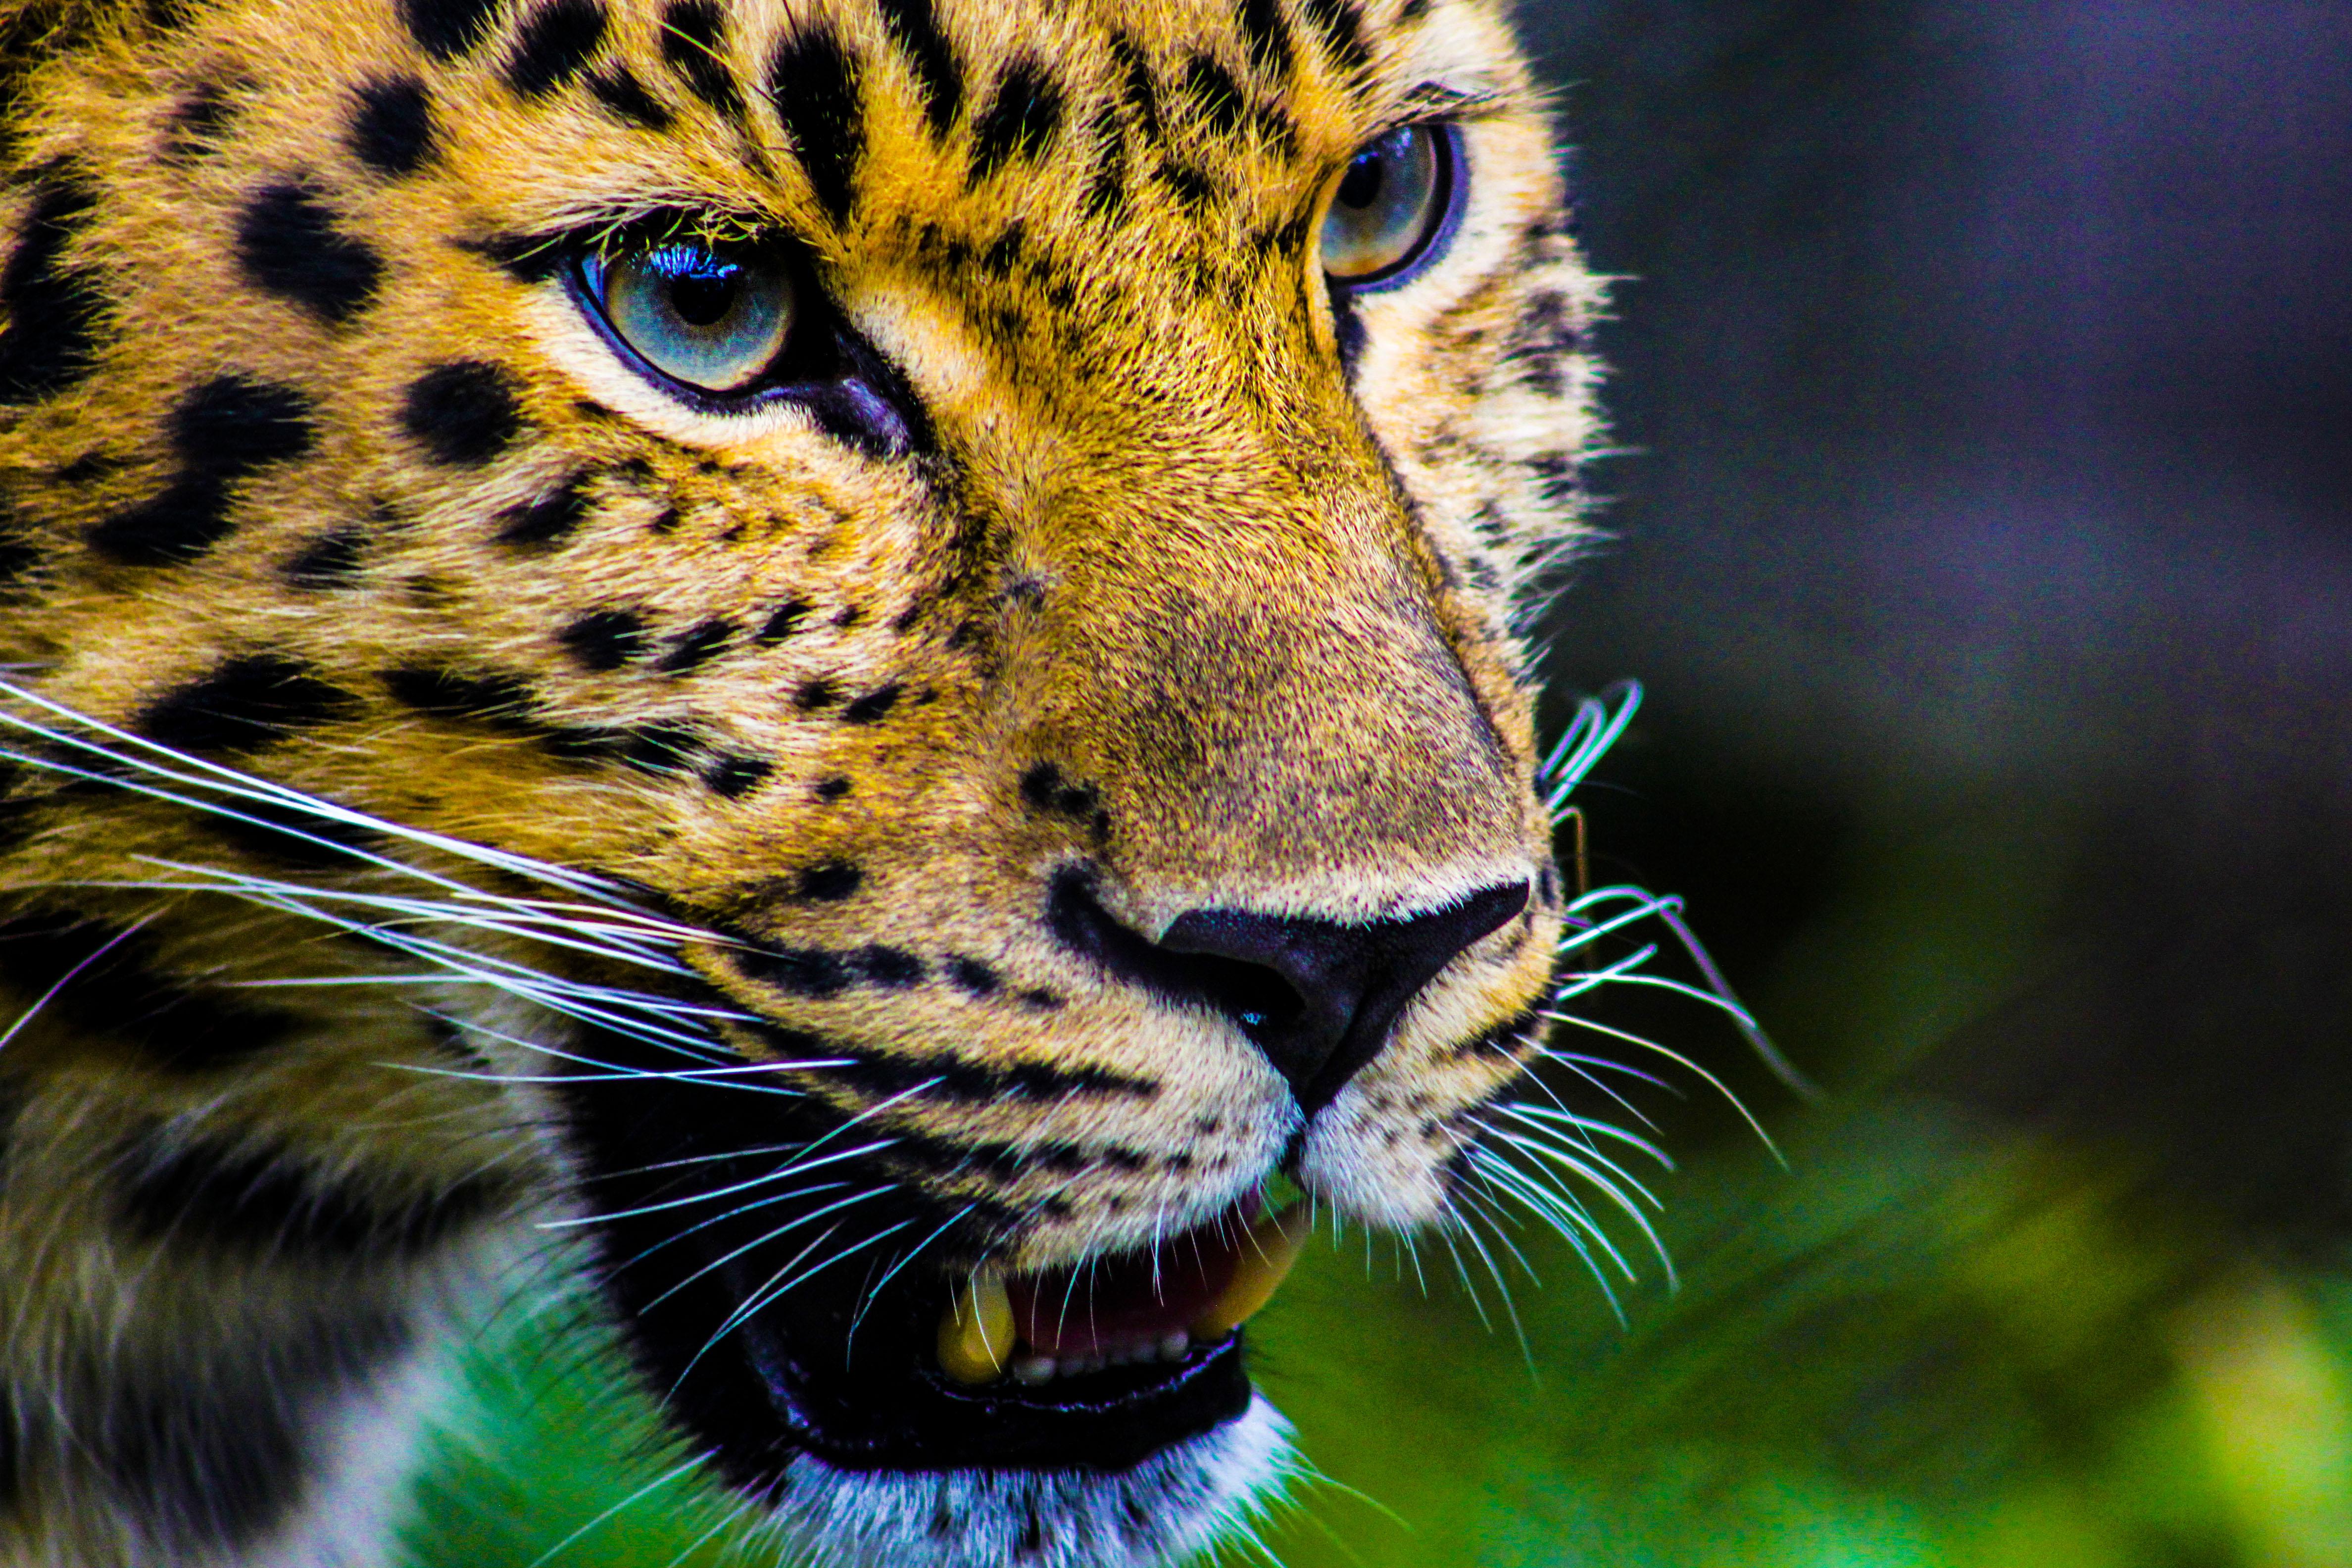 Nature Wallpaper Hd And Car Tiger Animal 183 Free Stock Photo